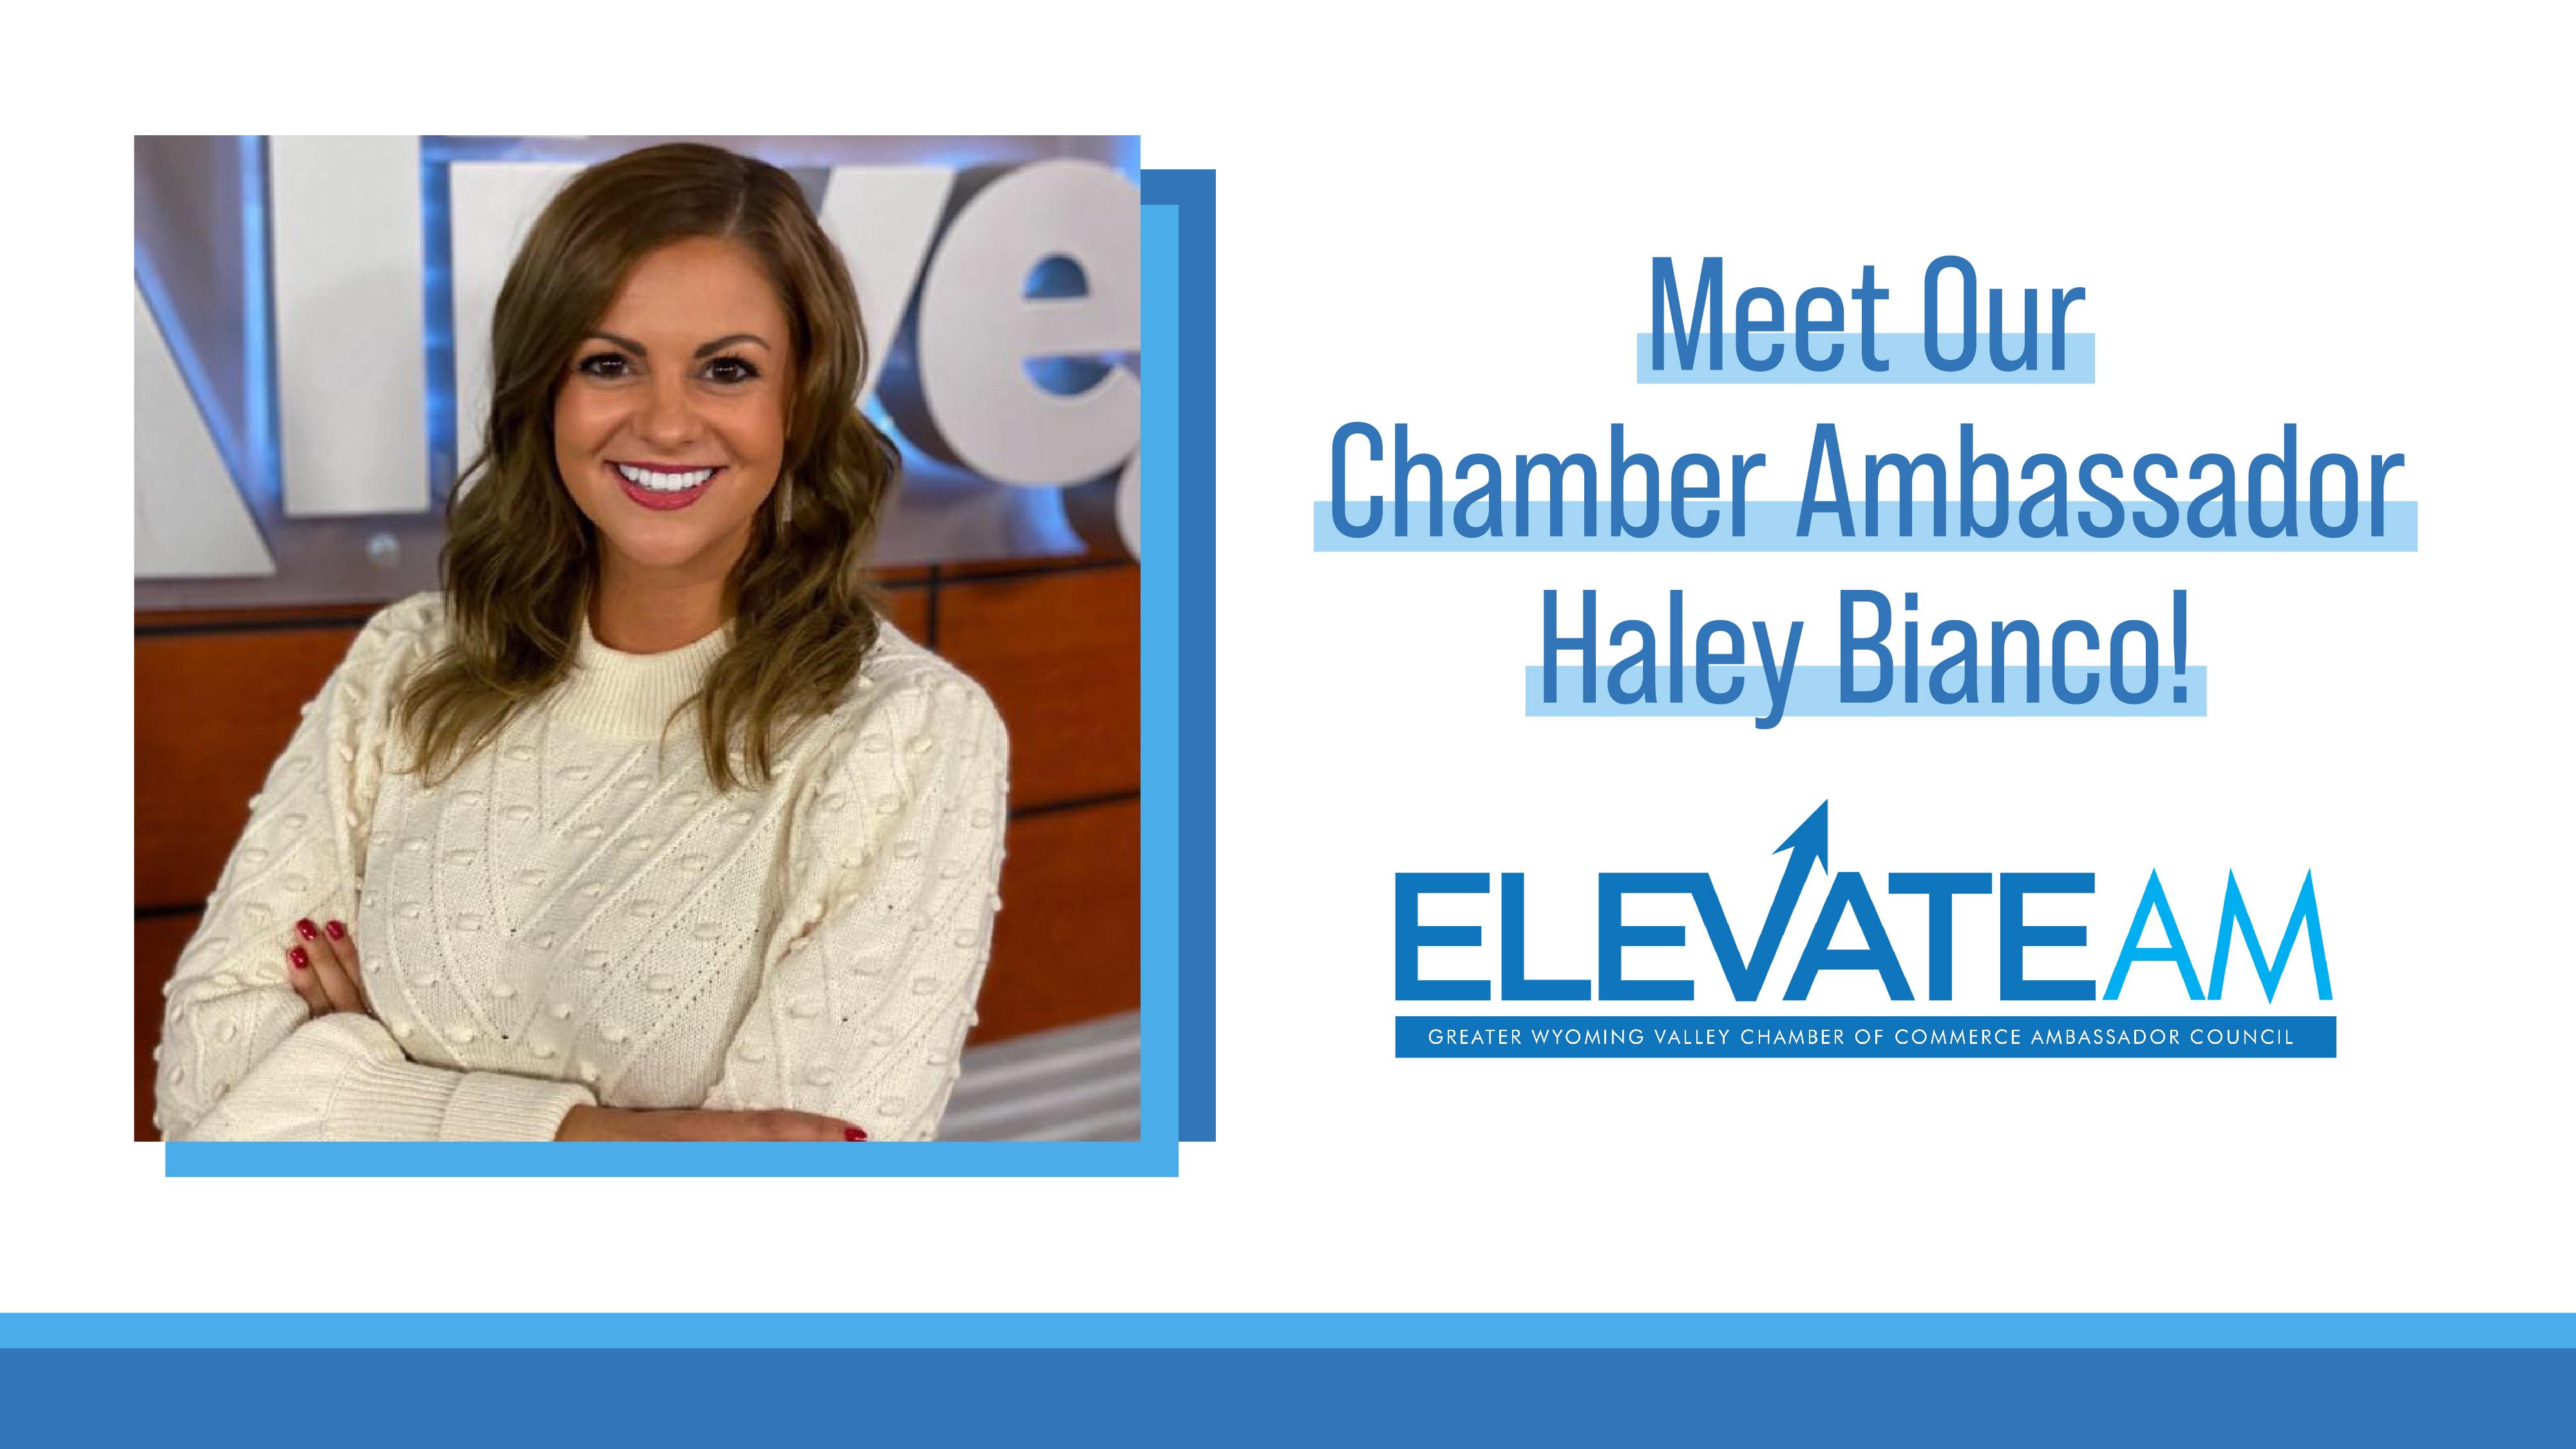 Meet Our Chamber Ambassador: Haley Bianco!